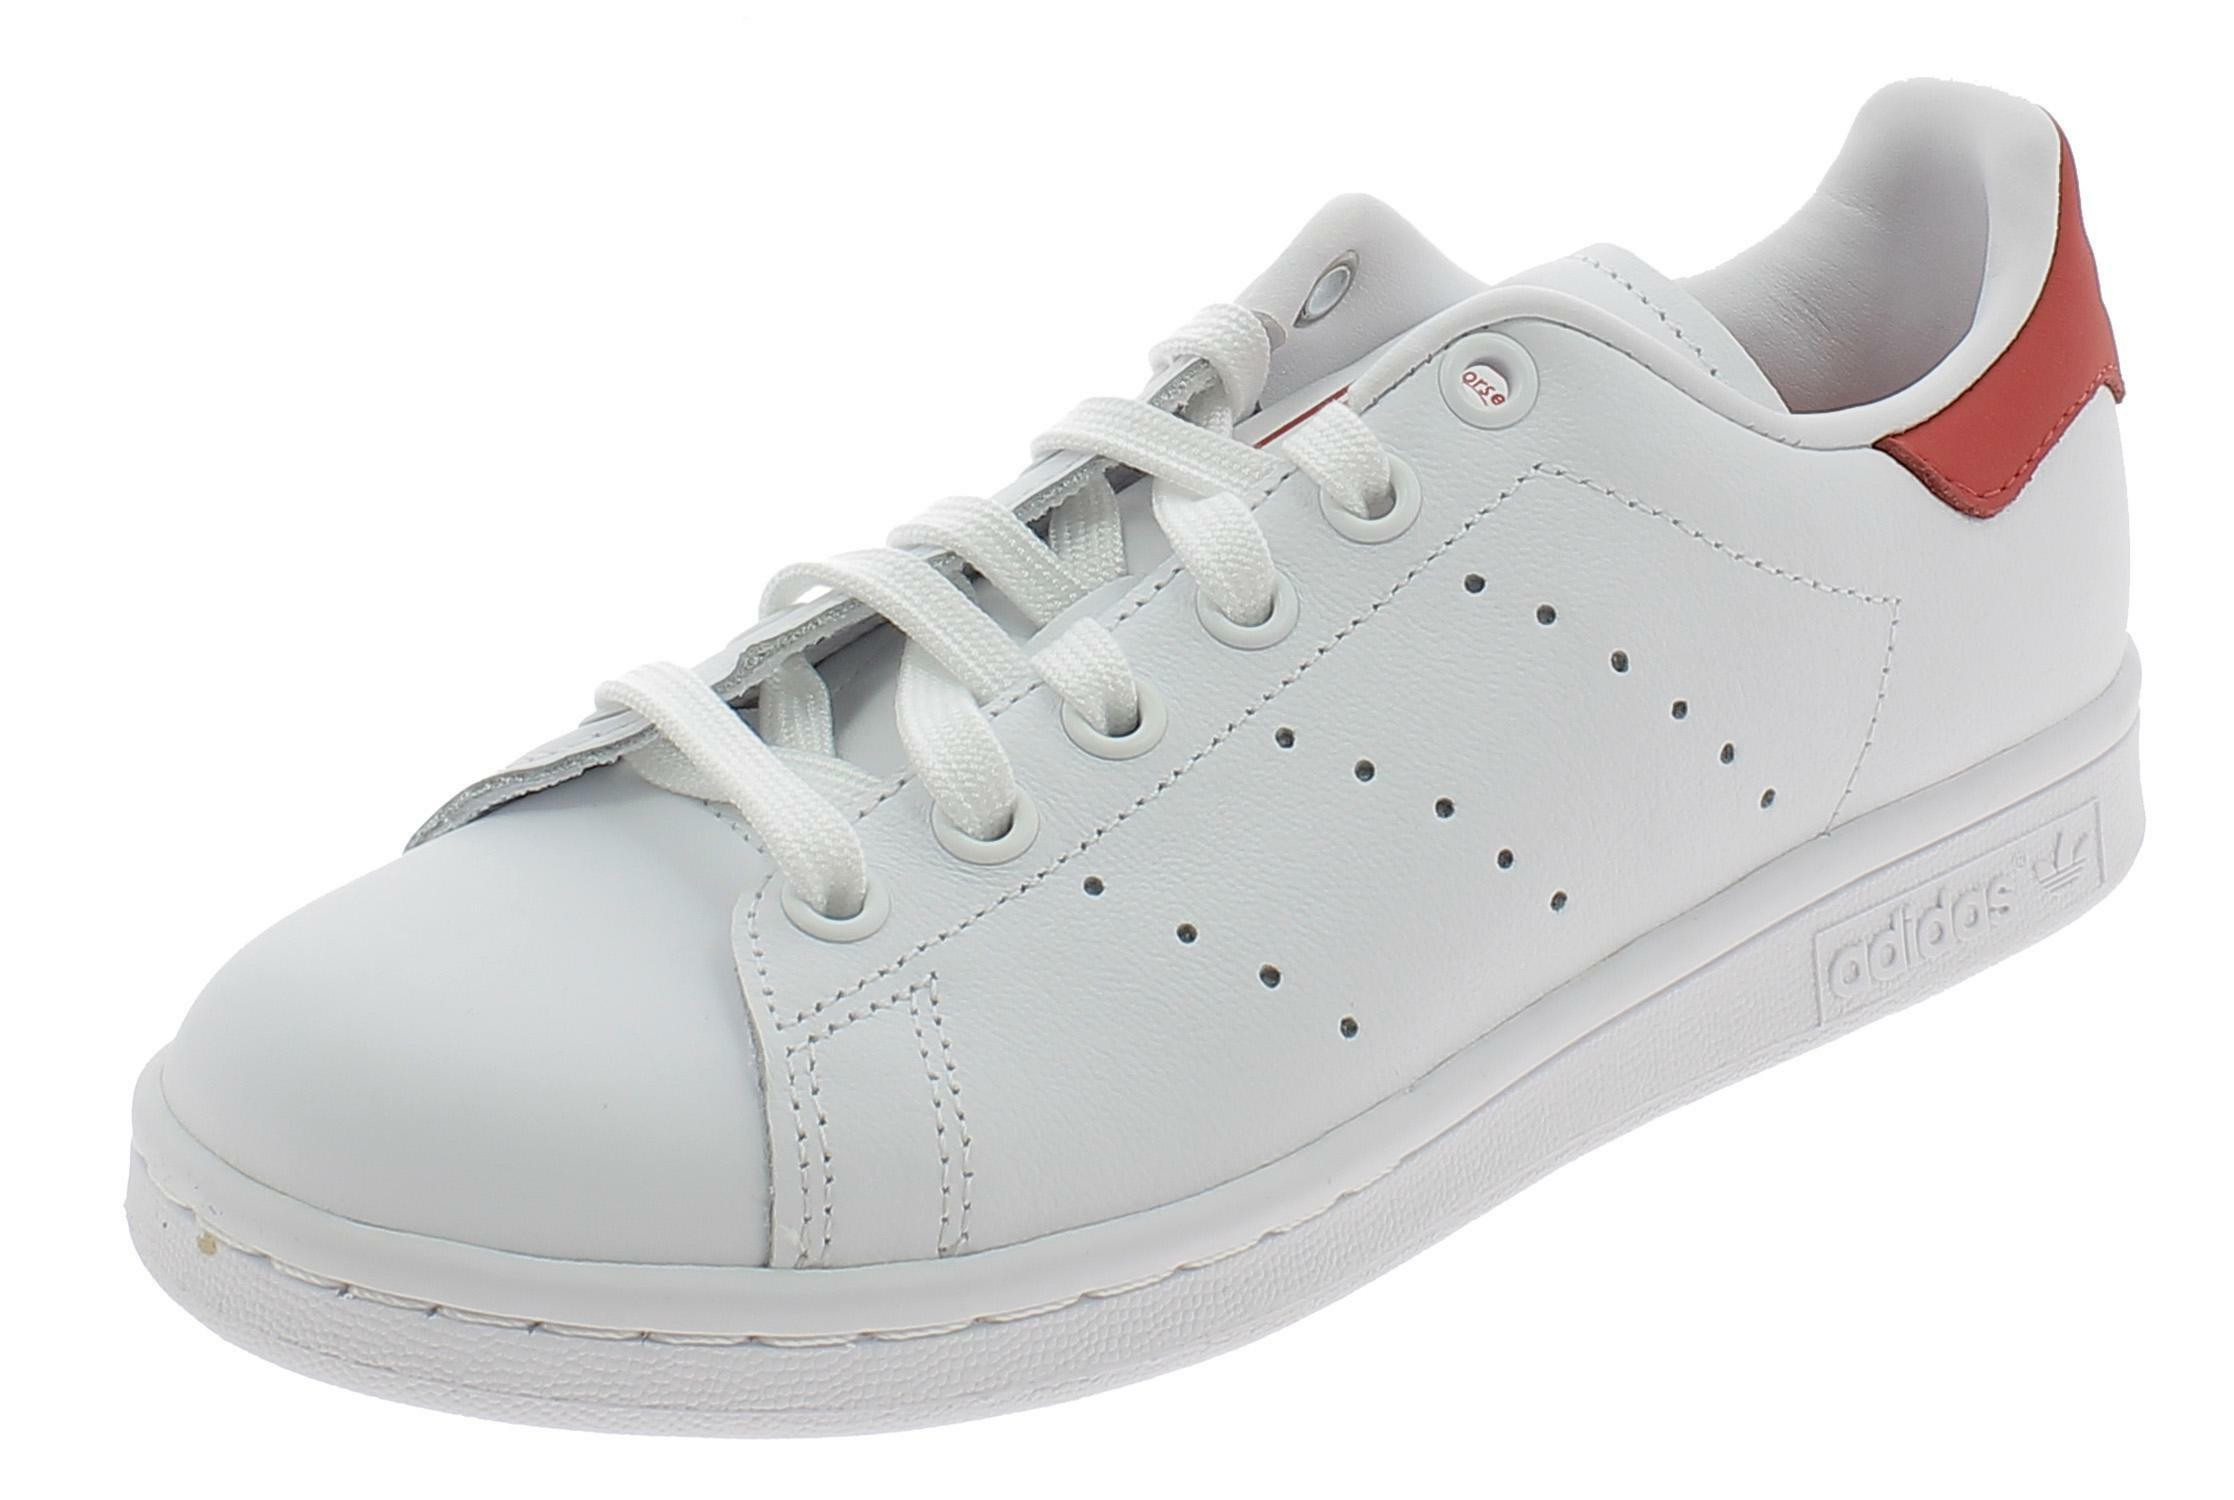 scarpe da uomo sportive adidas bianche